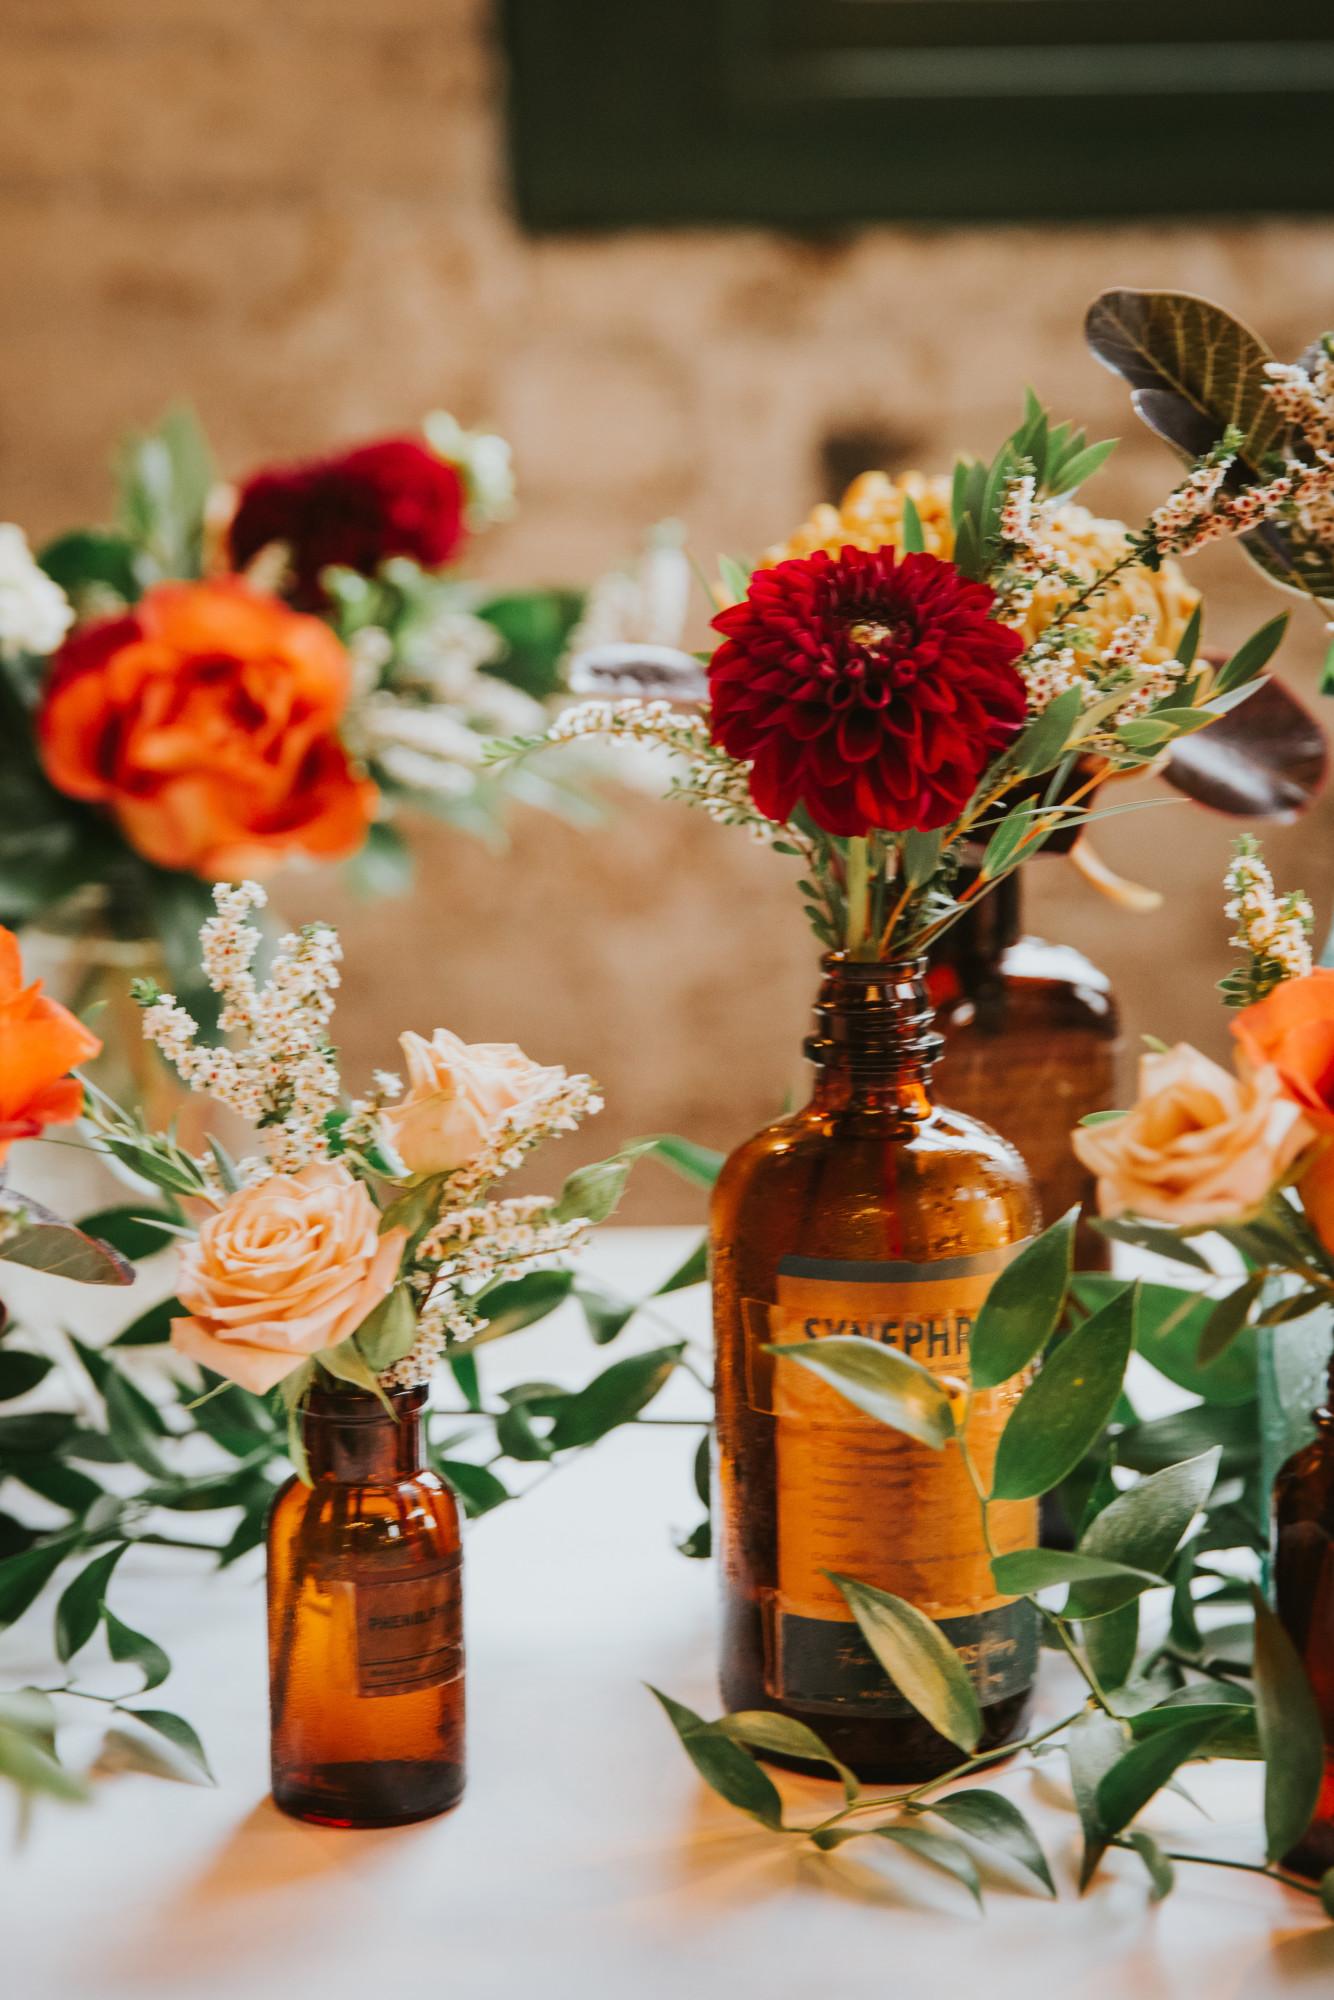 Beth-Ted-Balzacs-Coffee-Distillery-District-Toronto-Wedding-Planning-INLY-Events-Lushana-Bale-Photography-0102.jpg